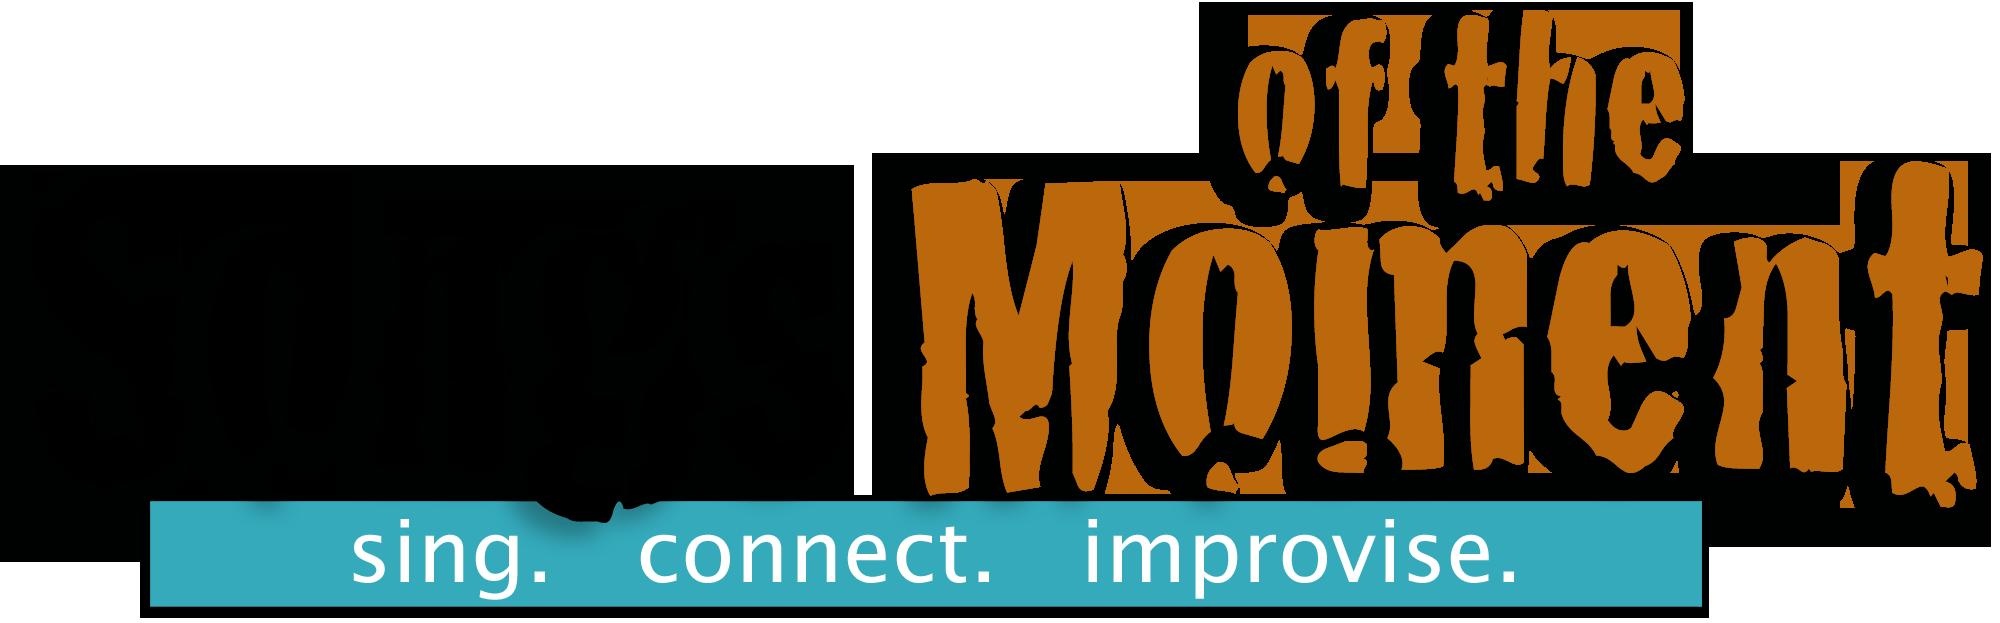 SOTM-logo-2014